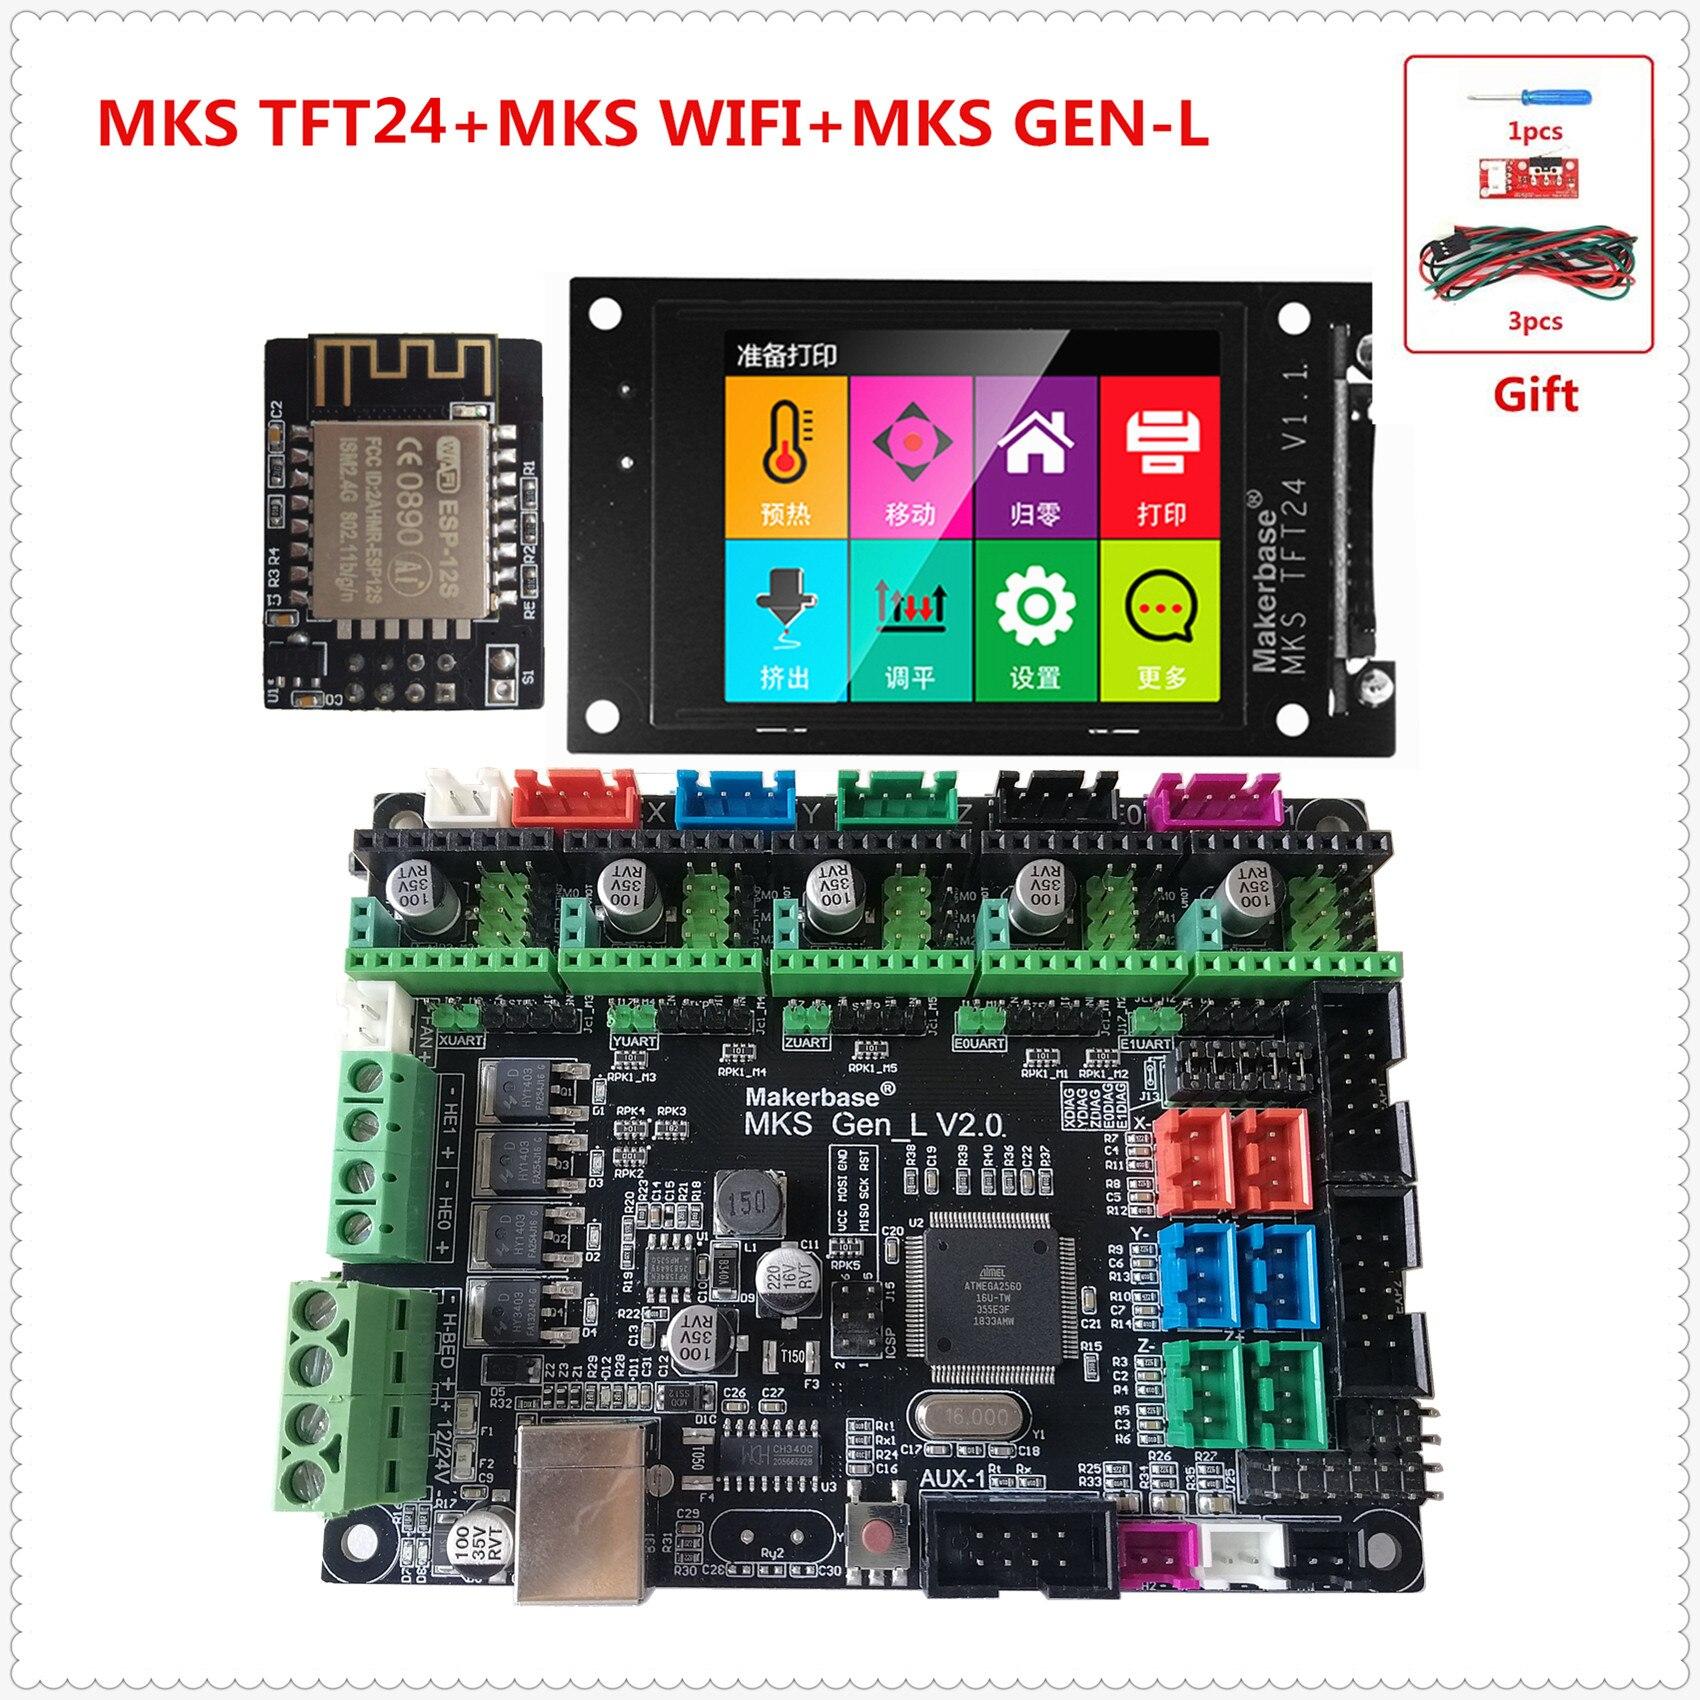 MKS GEN-L 2.0 Motherboard MKS TFT24 Touch Screen TFT 2.4 Lcd Display MKS WIFI 3D Printer Shield Control Panel Diy Starter Kit